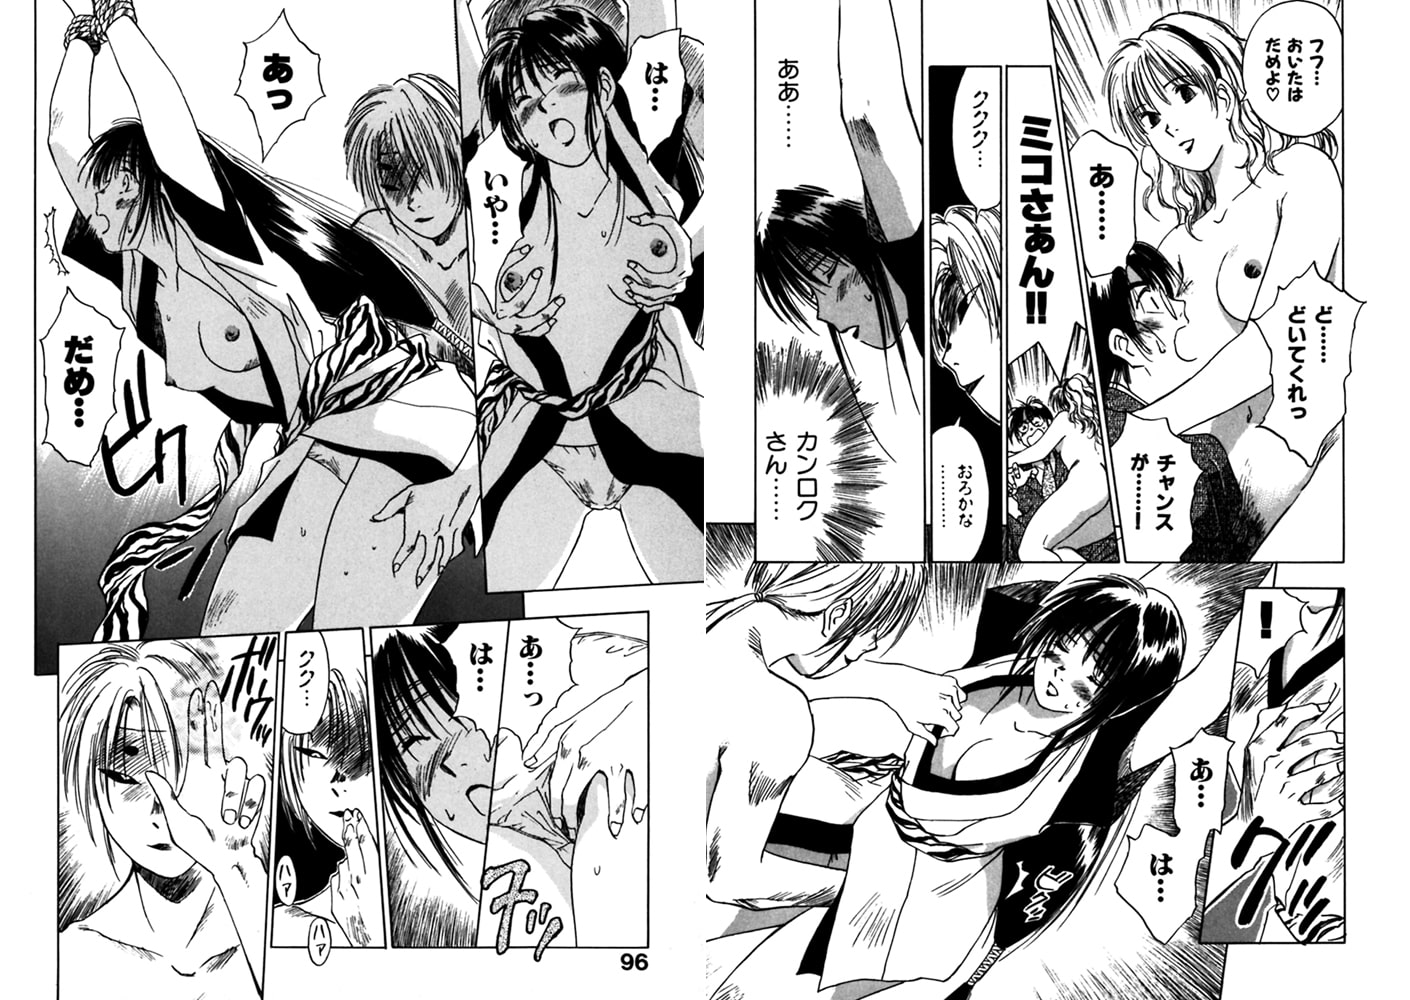 霊能探偵ミコ 第2巻